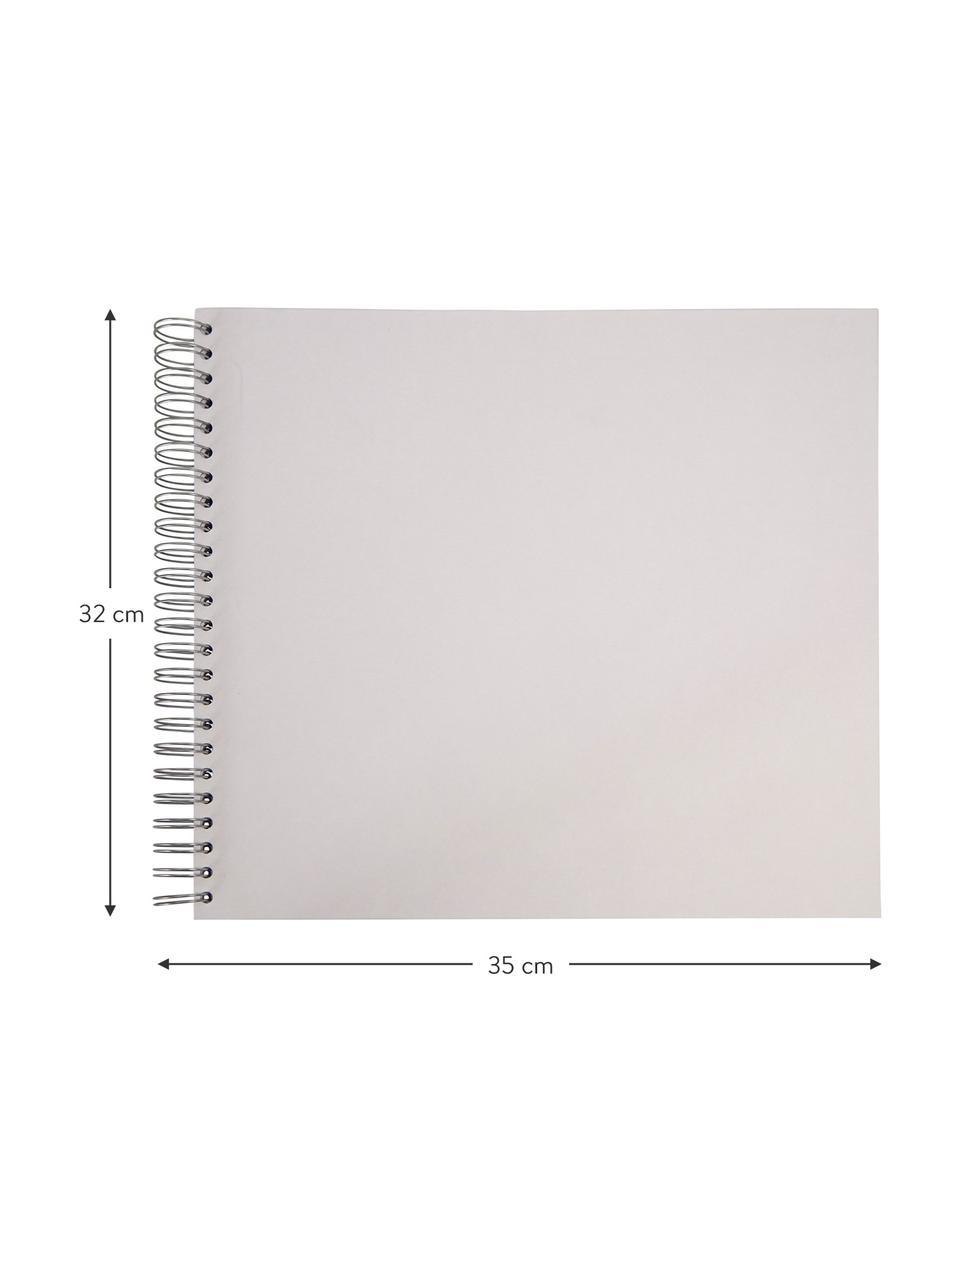 Fotoalbum Picture, Weiß, 35 x 32 cm